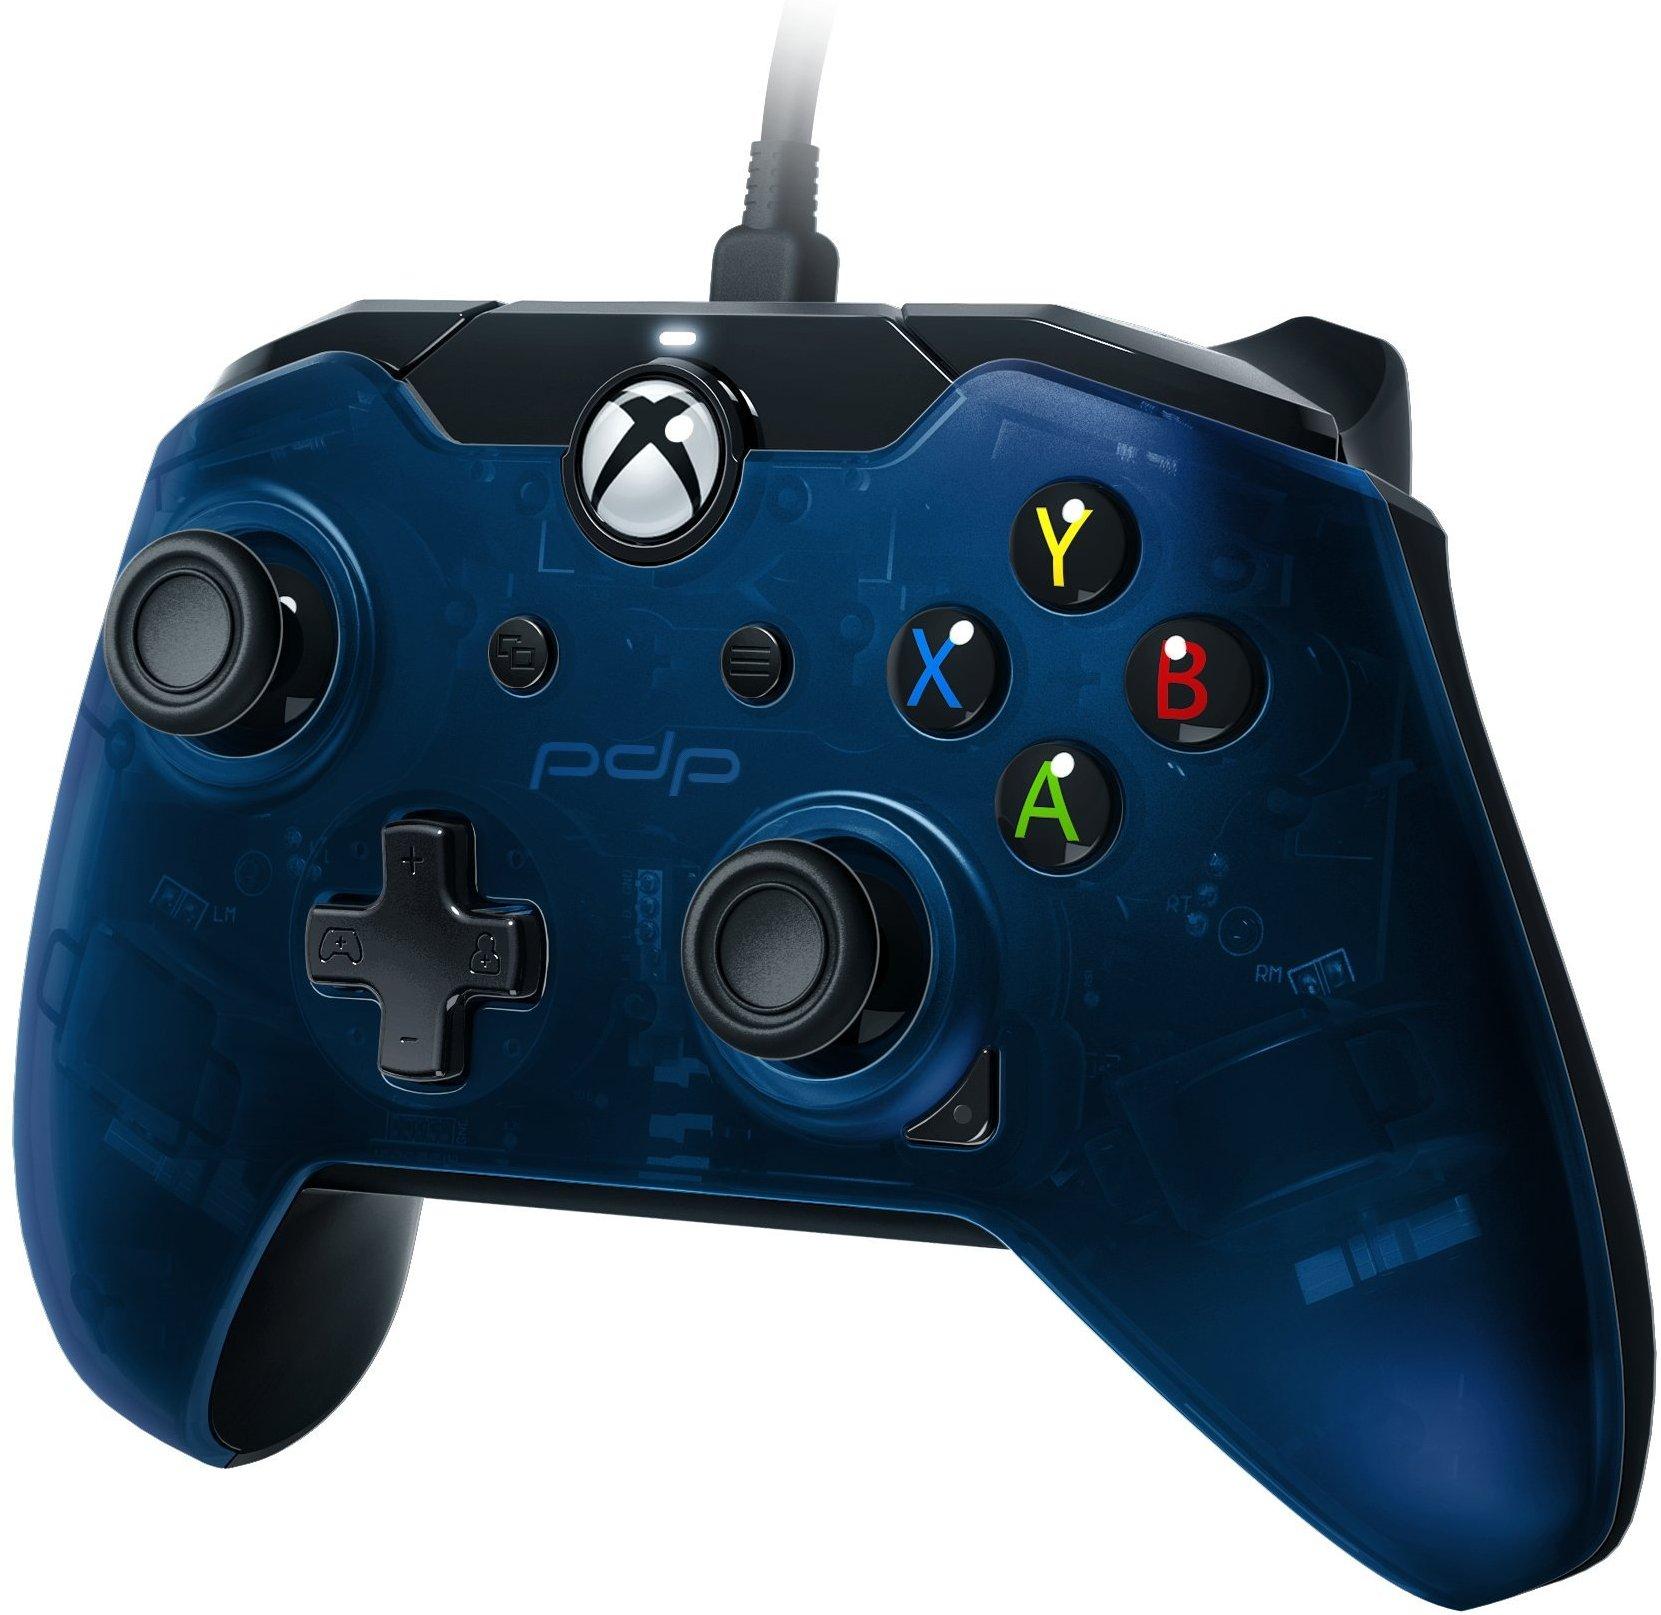 Pdp Mando Con Cable Azul Xbox One Pc Discoazul Com